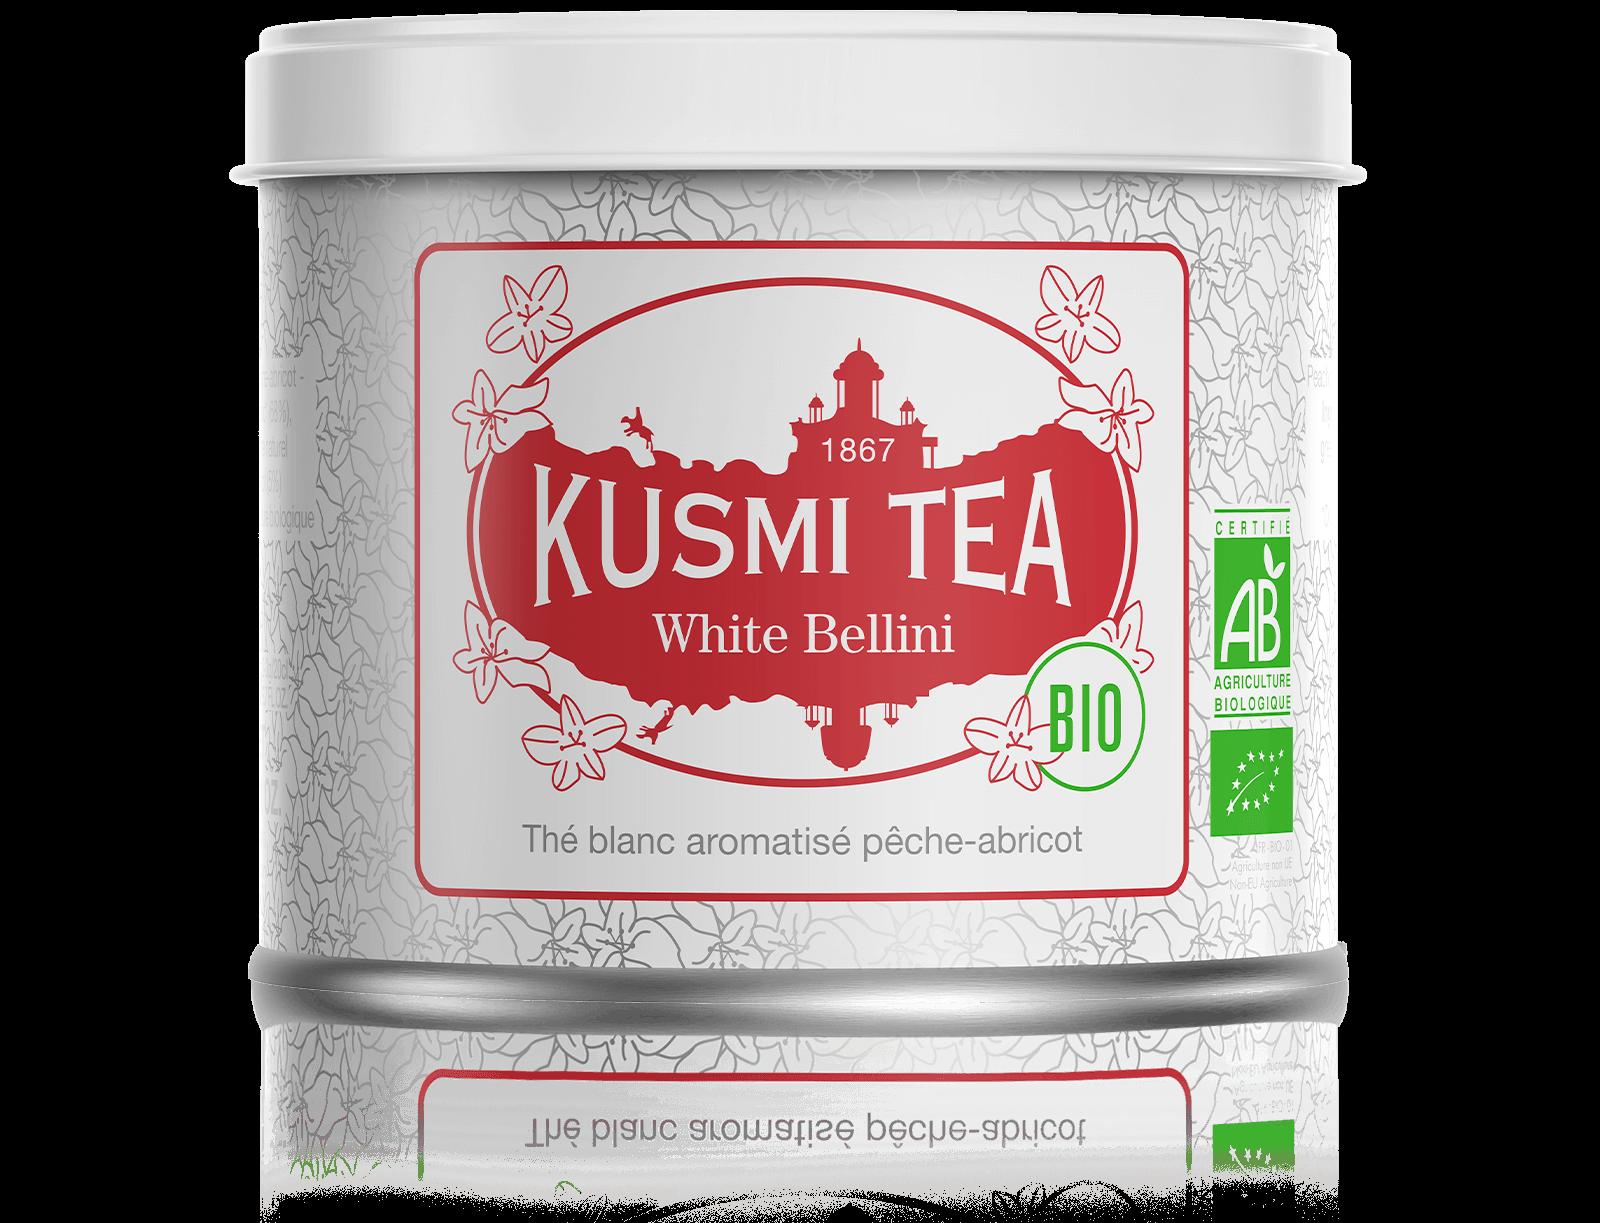 White Bellini bio - Thé blanc aromatisé pêche-abricot - Boite à thé en vrac - Kusmi Tea